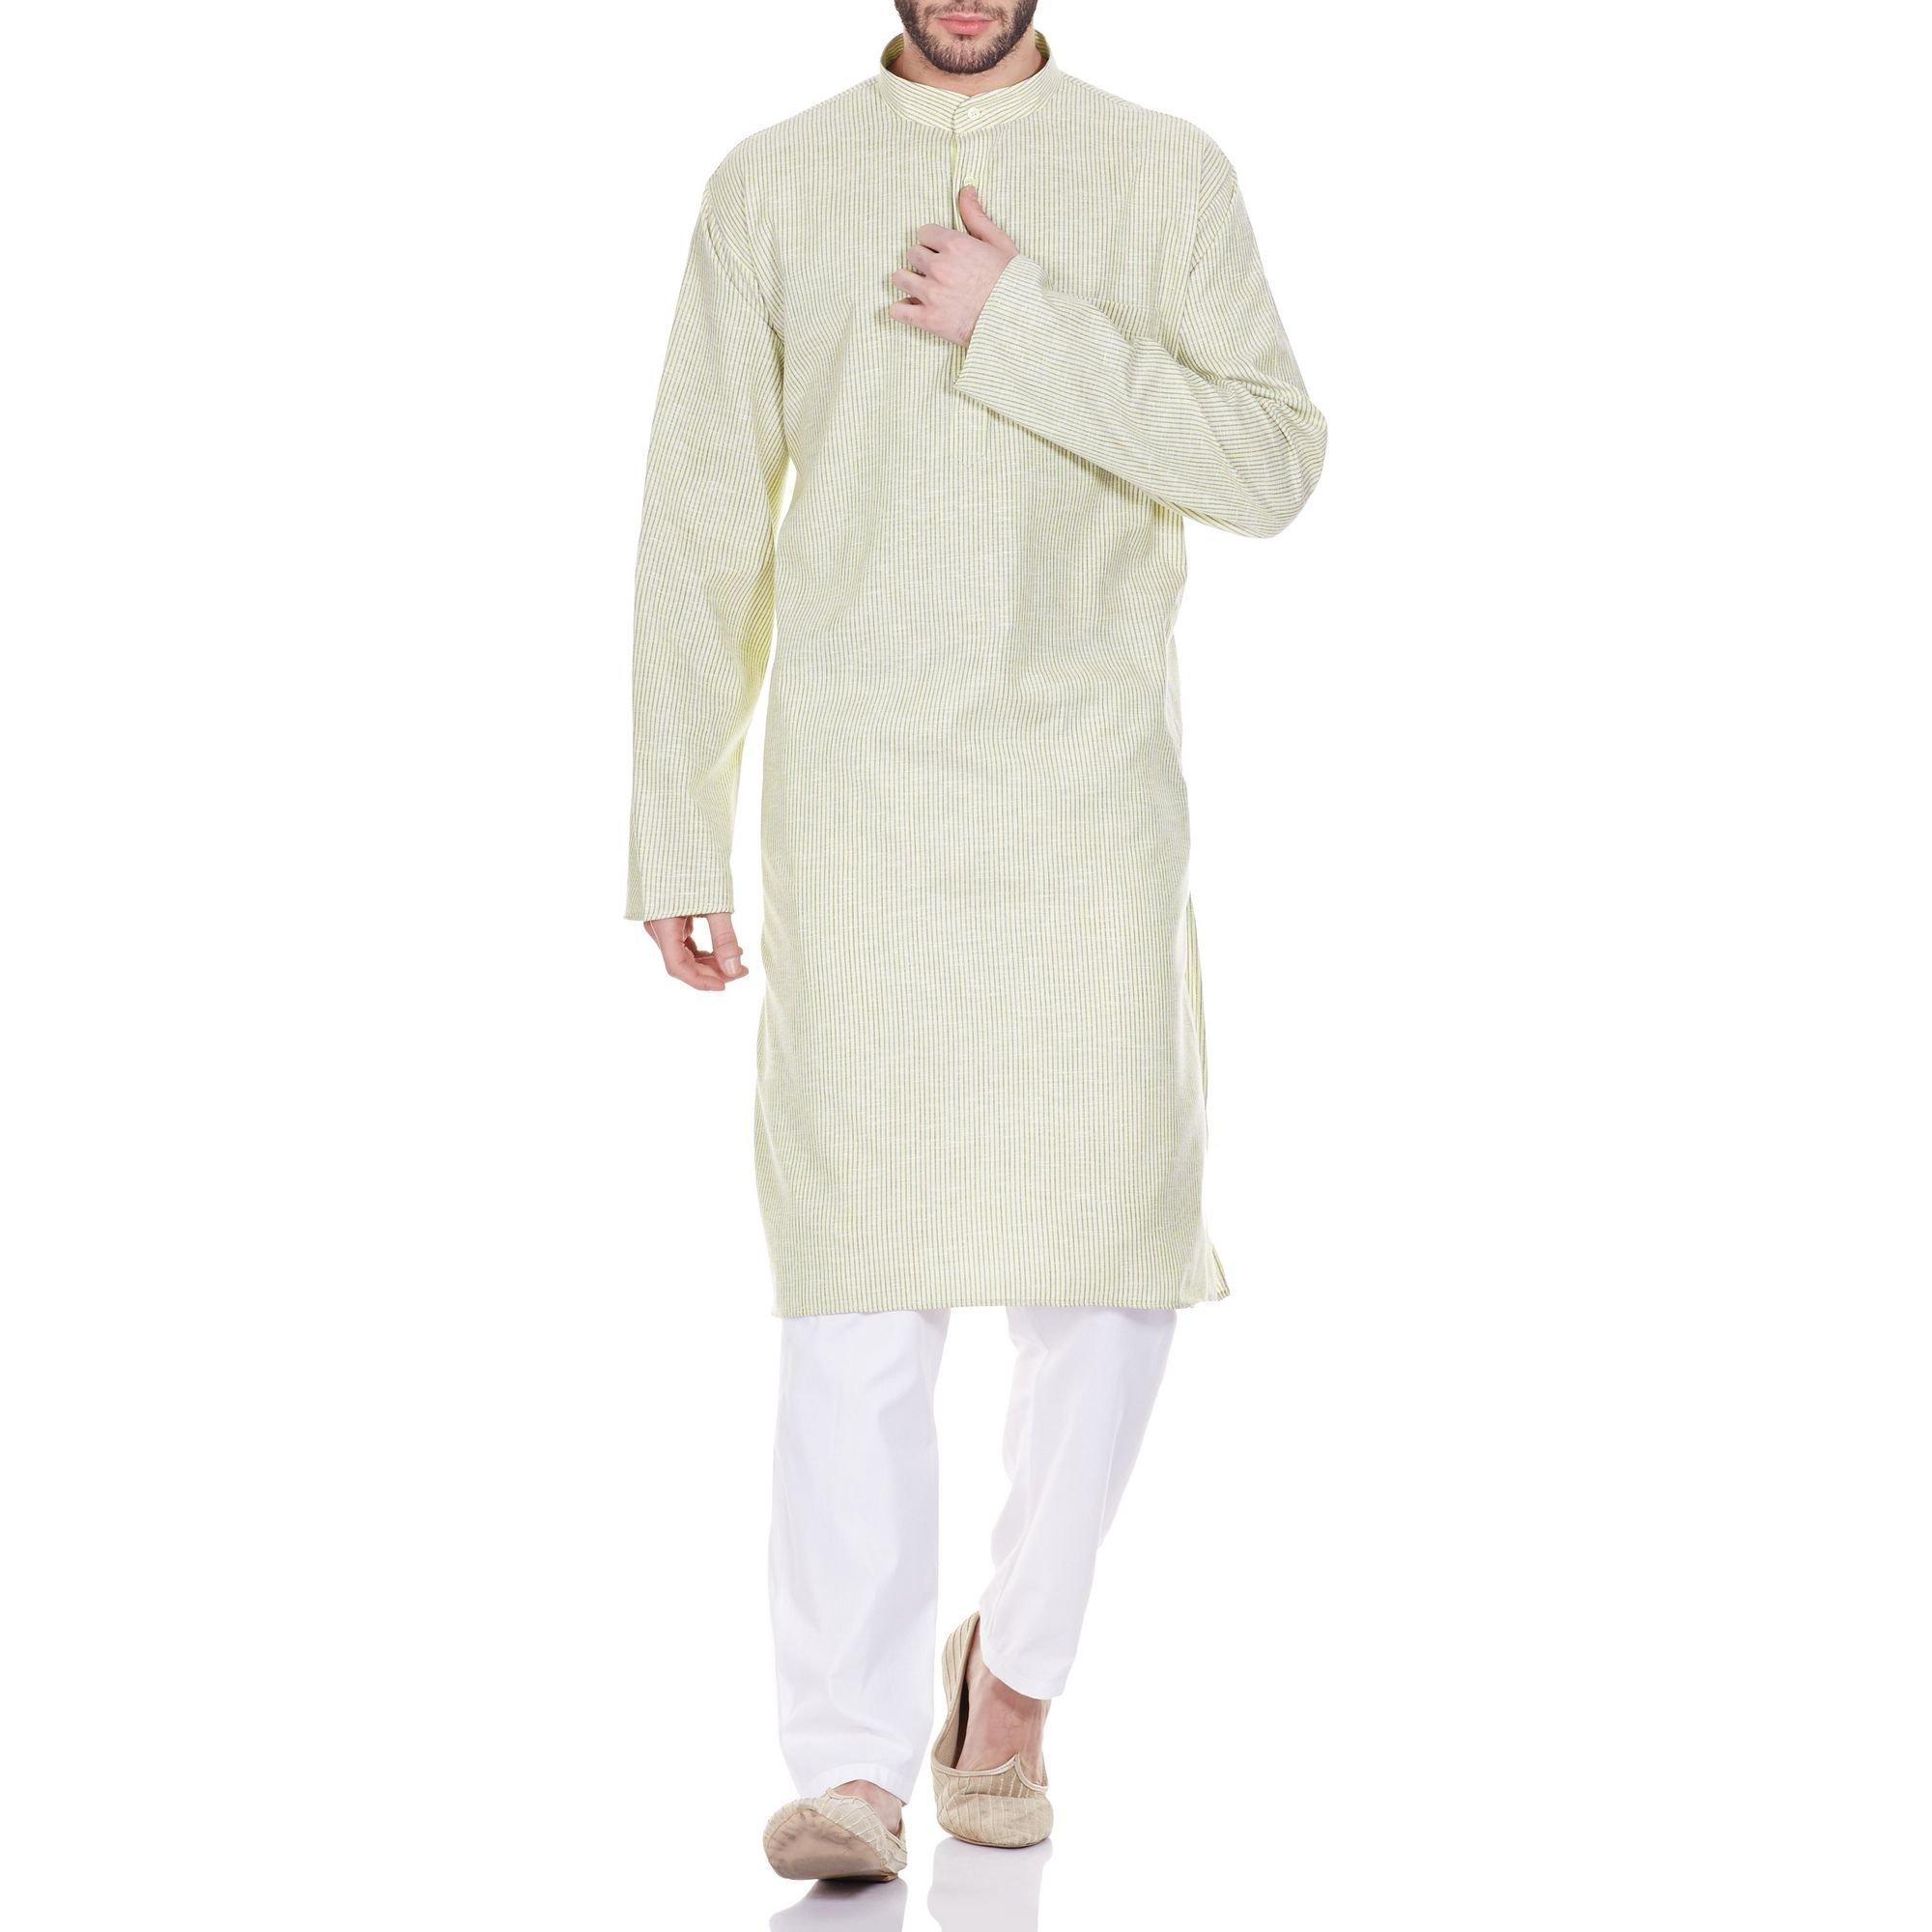 Men Costume Indian Kurta Pajama Set Comfort Fit Anniversary Gifts 44 Inches